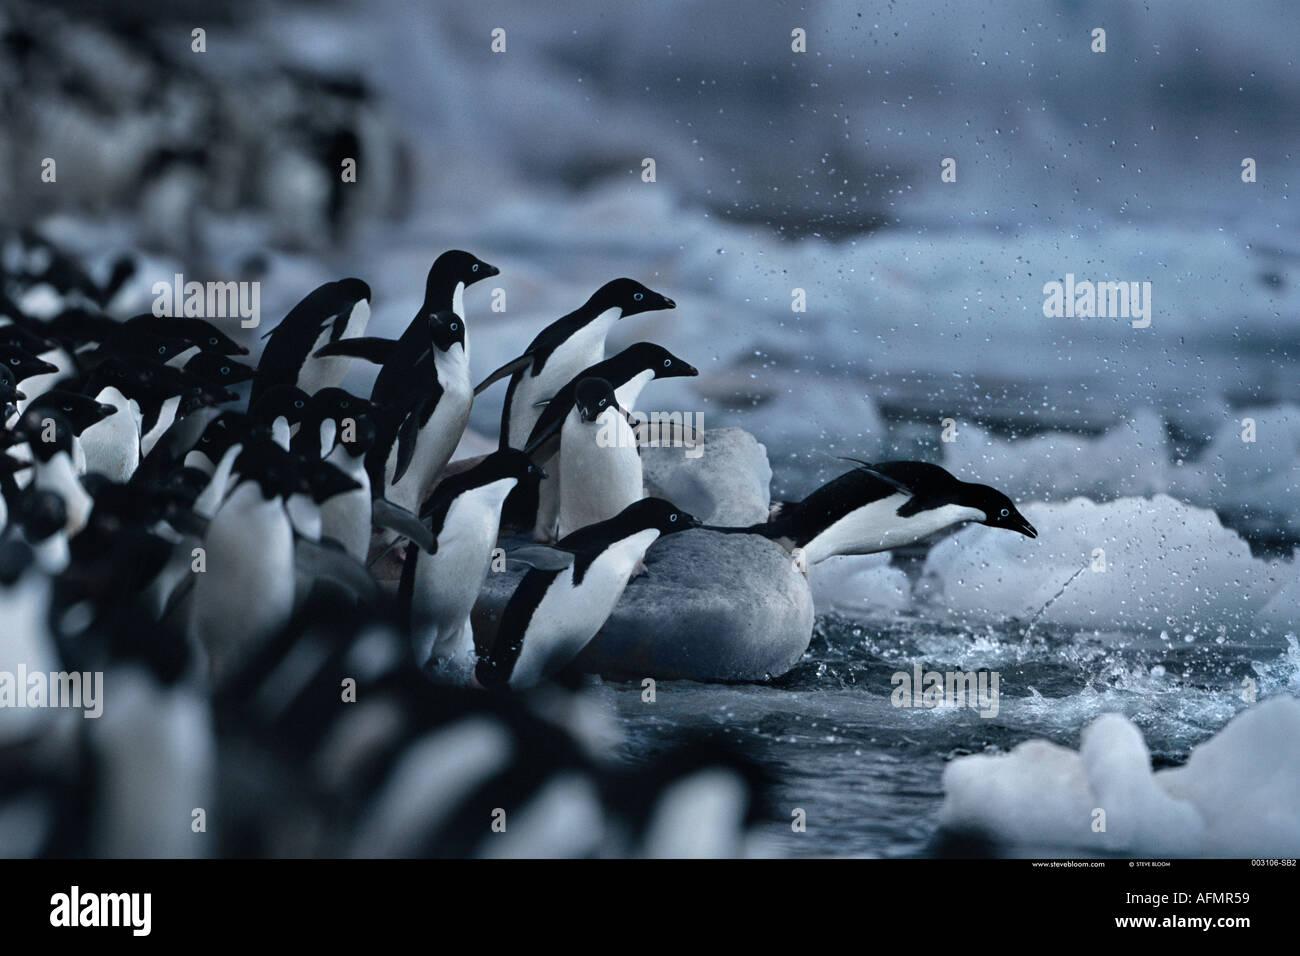 Adelie penguins Paulet Island Antartide Immagini Stock